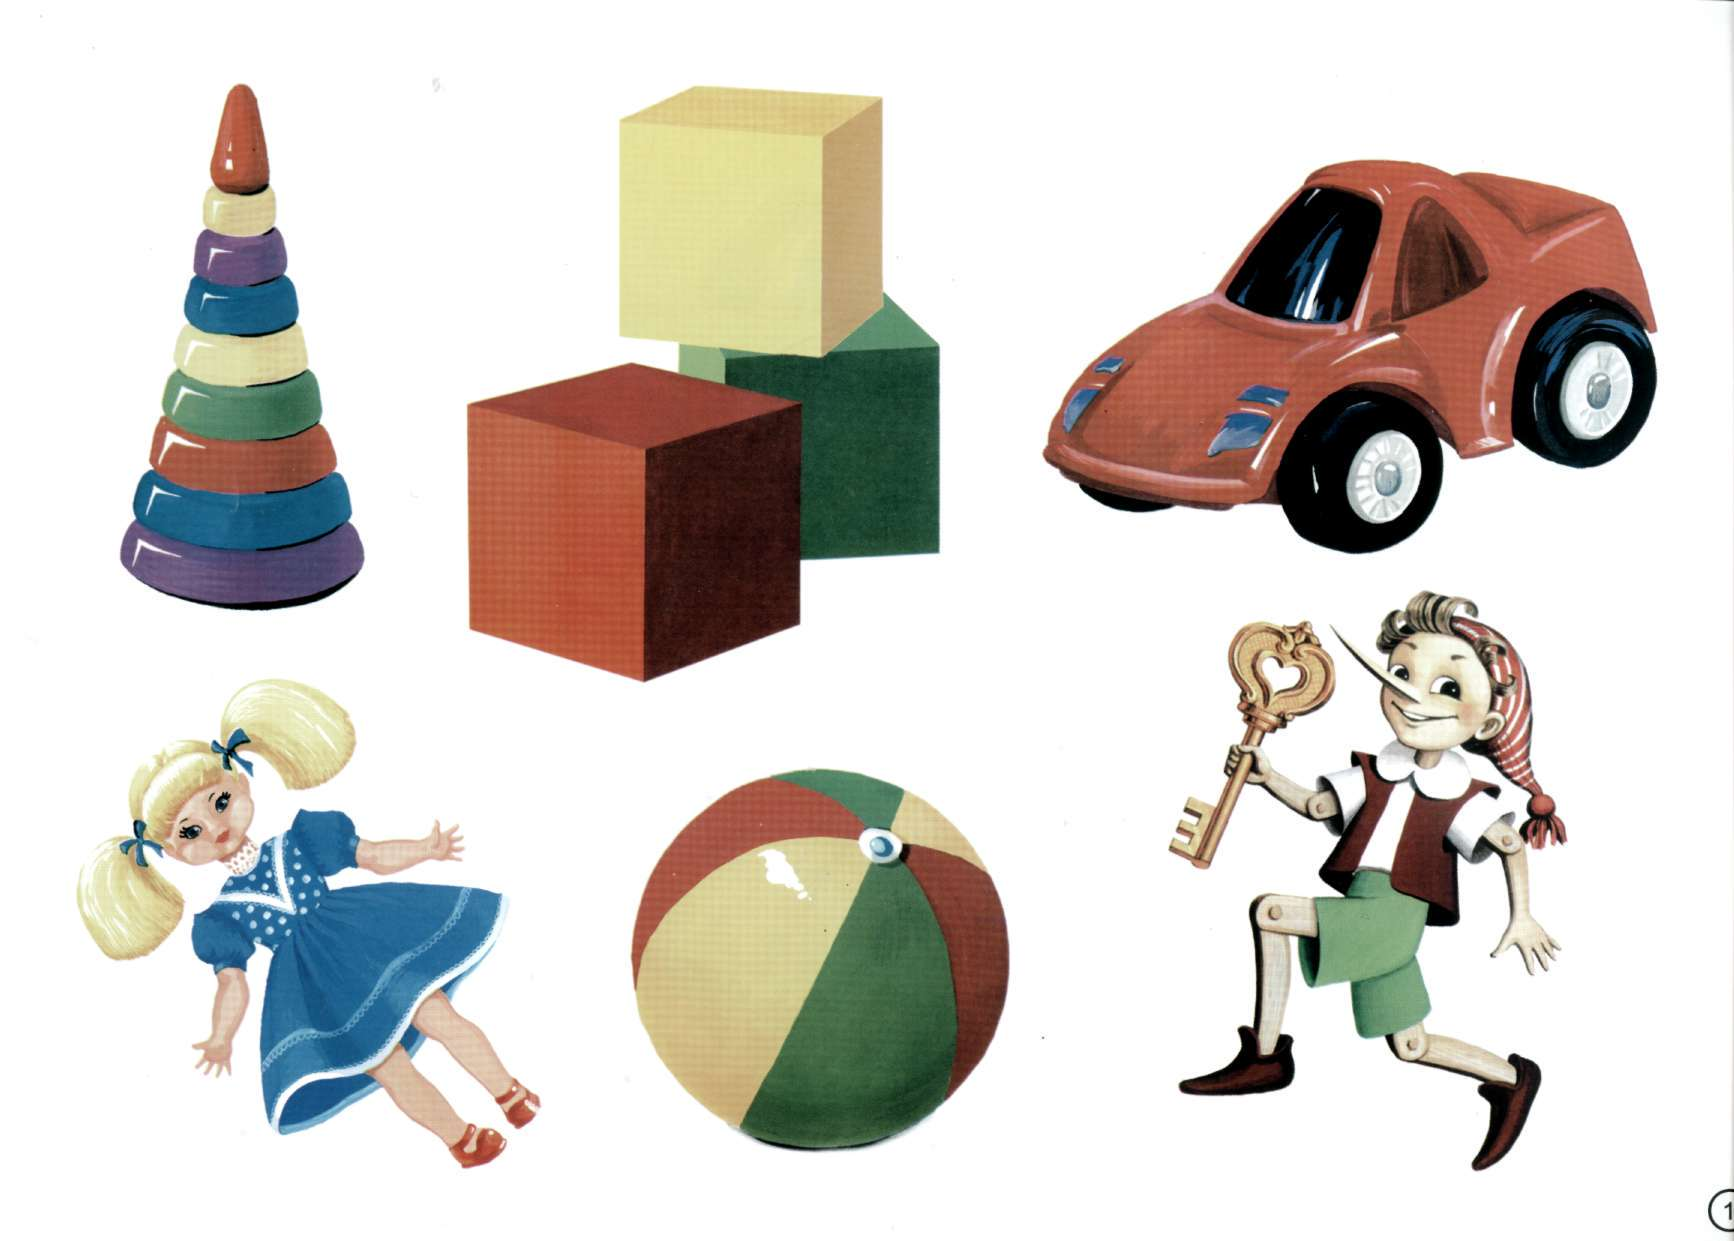 только тематический картинки игрушки калининград